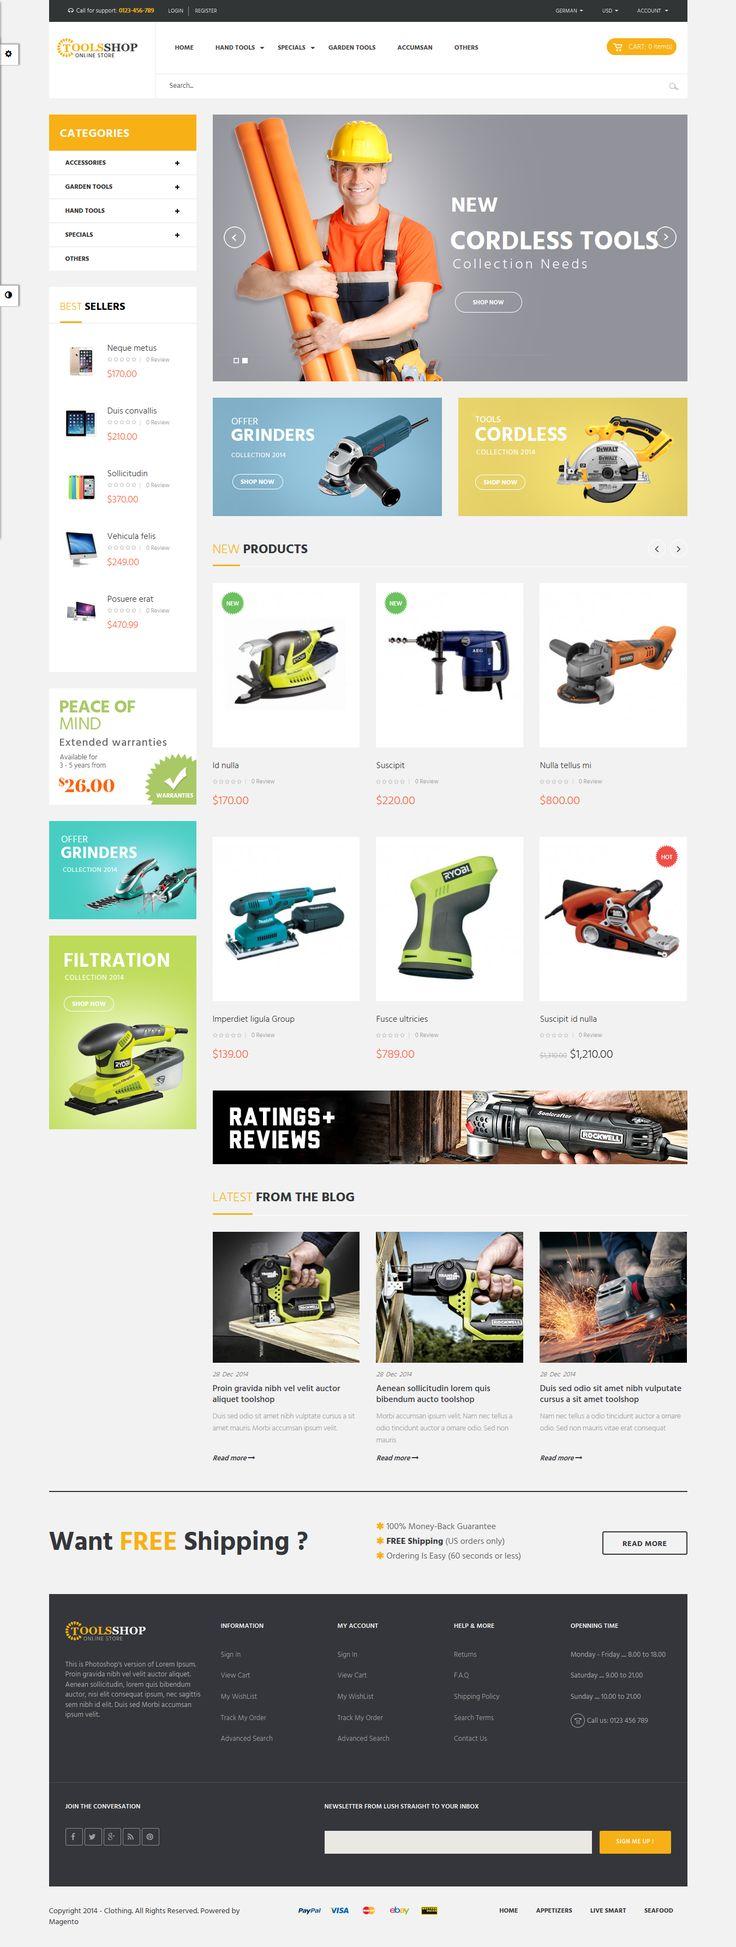 302 best images about eCommerce on Pinterest | Ecommerce websites ...